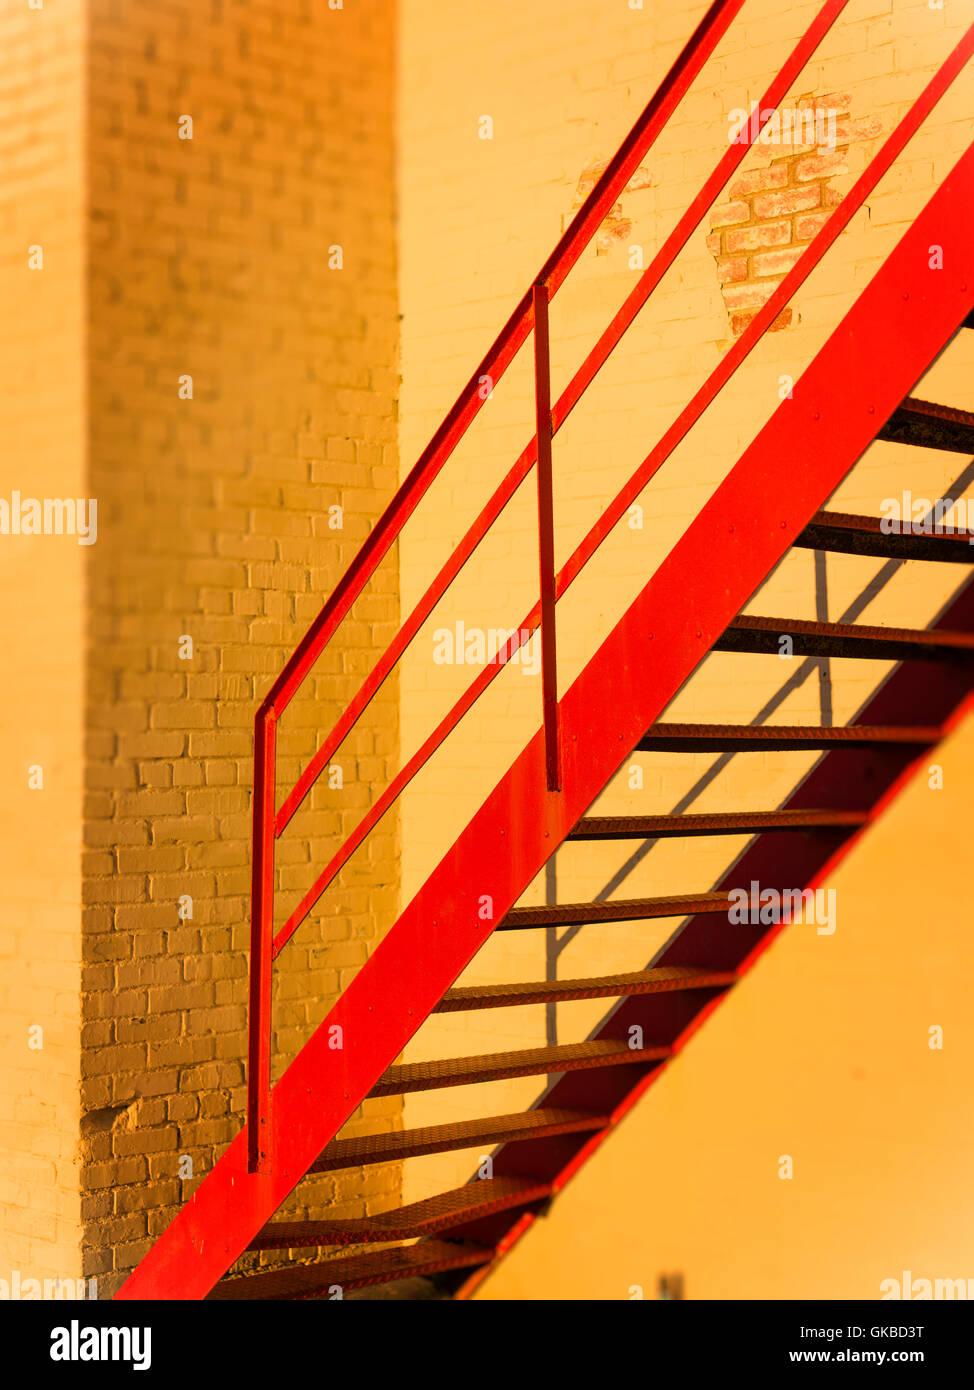 Red stairwell against yellow painted bricks during 'Golden Hour', Virginia Beach, VA - Stock Image